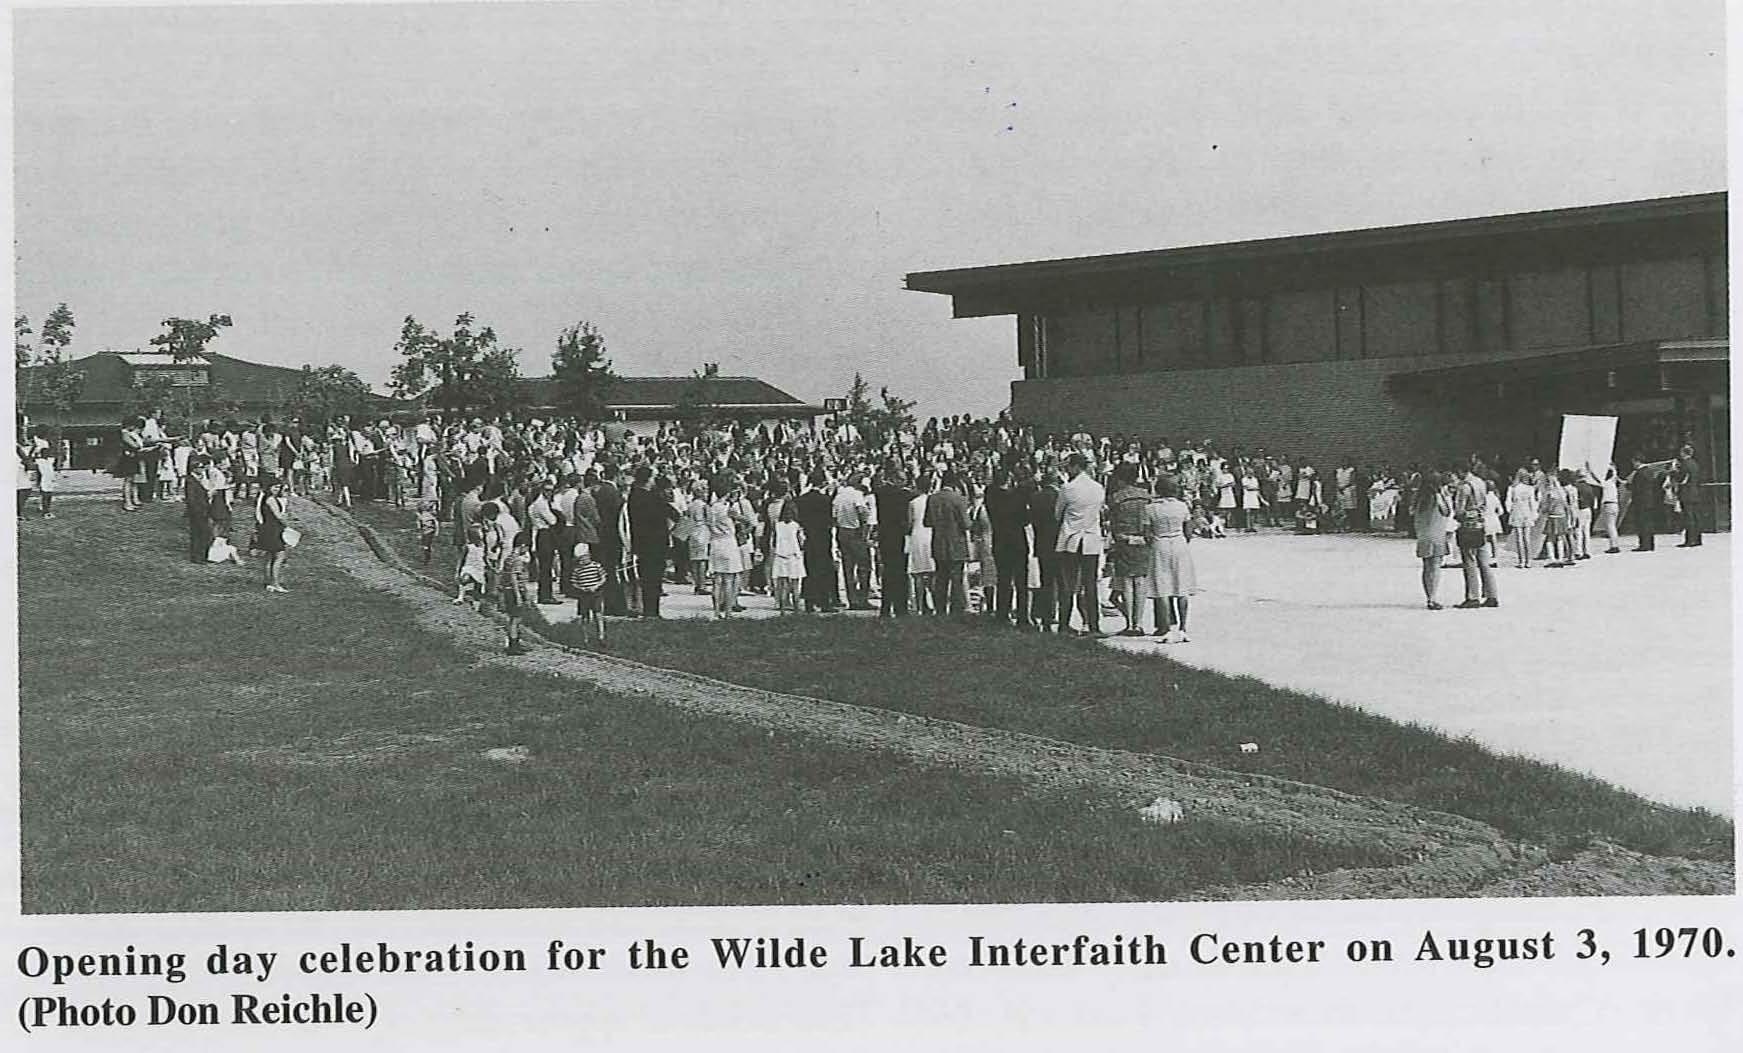 Wilde Lake Interfaith Center  Opening Day Celebration 08-03-1970 at Wilde Lake Village Center